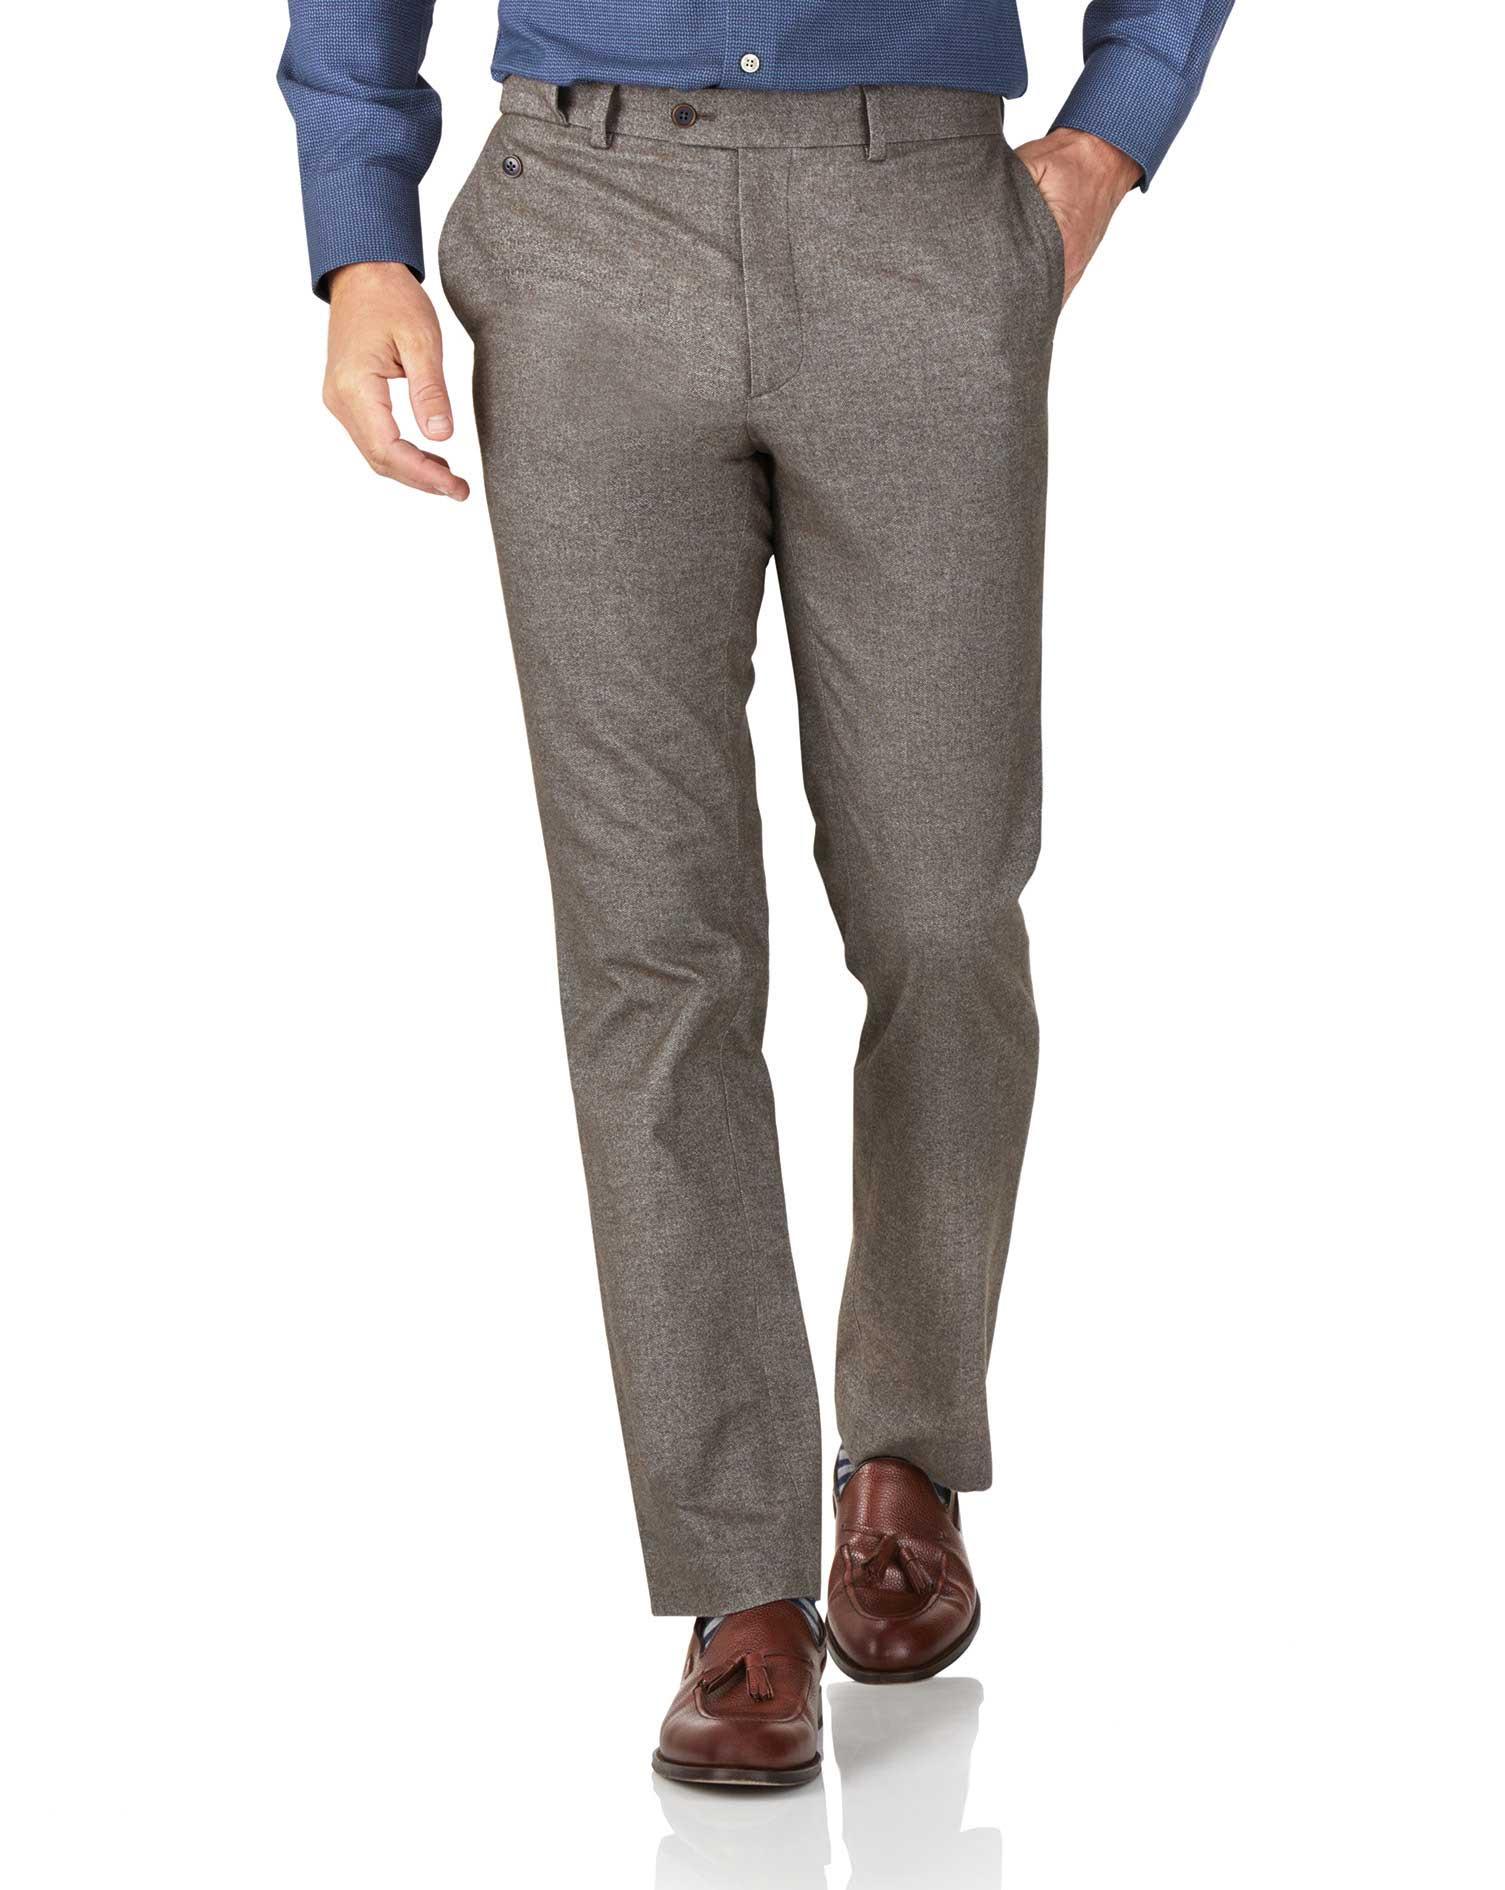 Light Brown Slim Fit Cotton Flannel Herringbone Trousers Charles